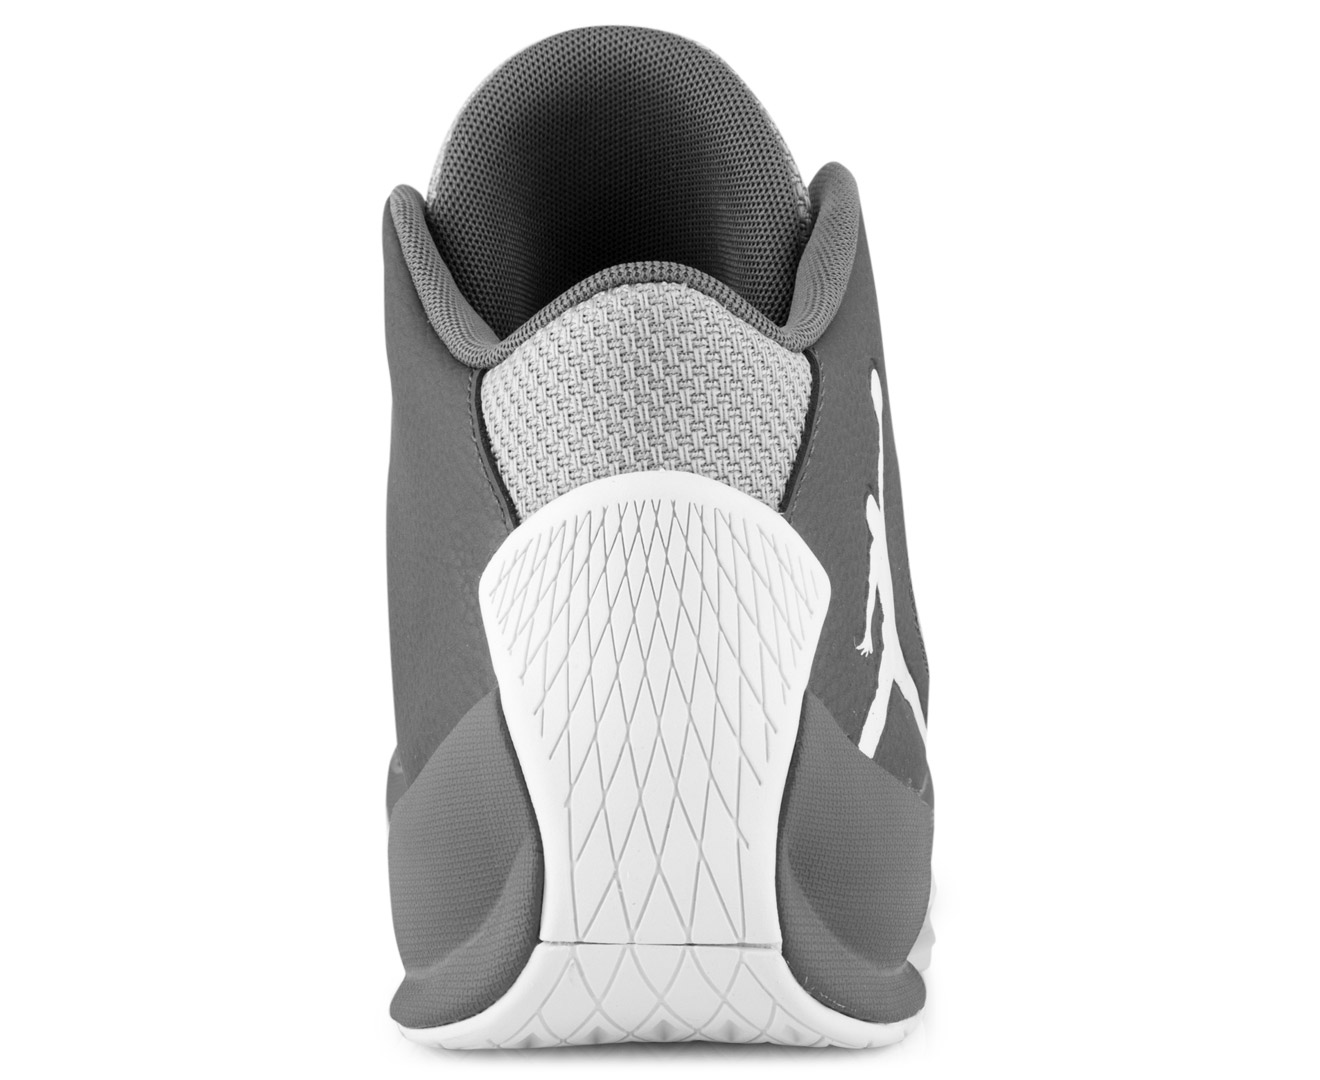 huge selection of 34361 22d3f Nike Men s Jordan Rising High 2 Basketball Shoe - Wolf Grey White Cool Grey  Infrared 23   Catch.com.au